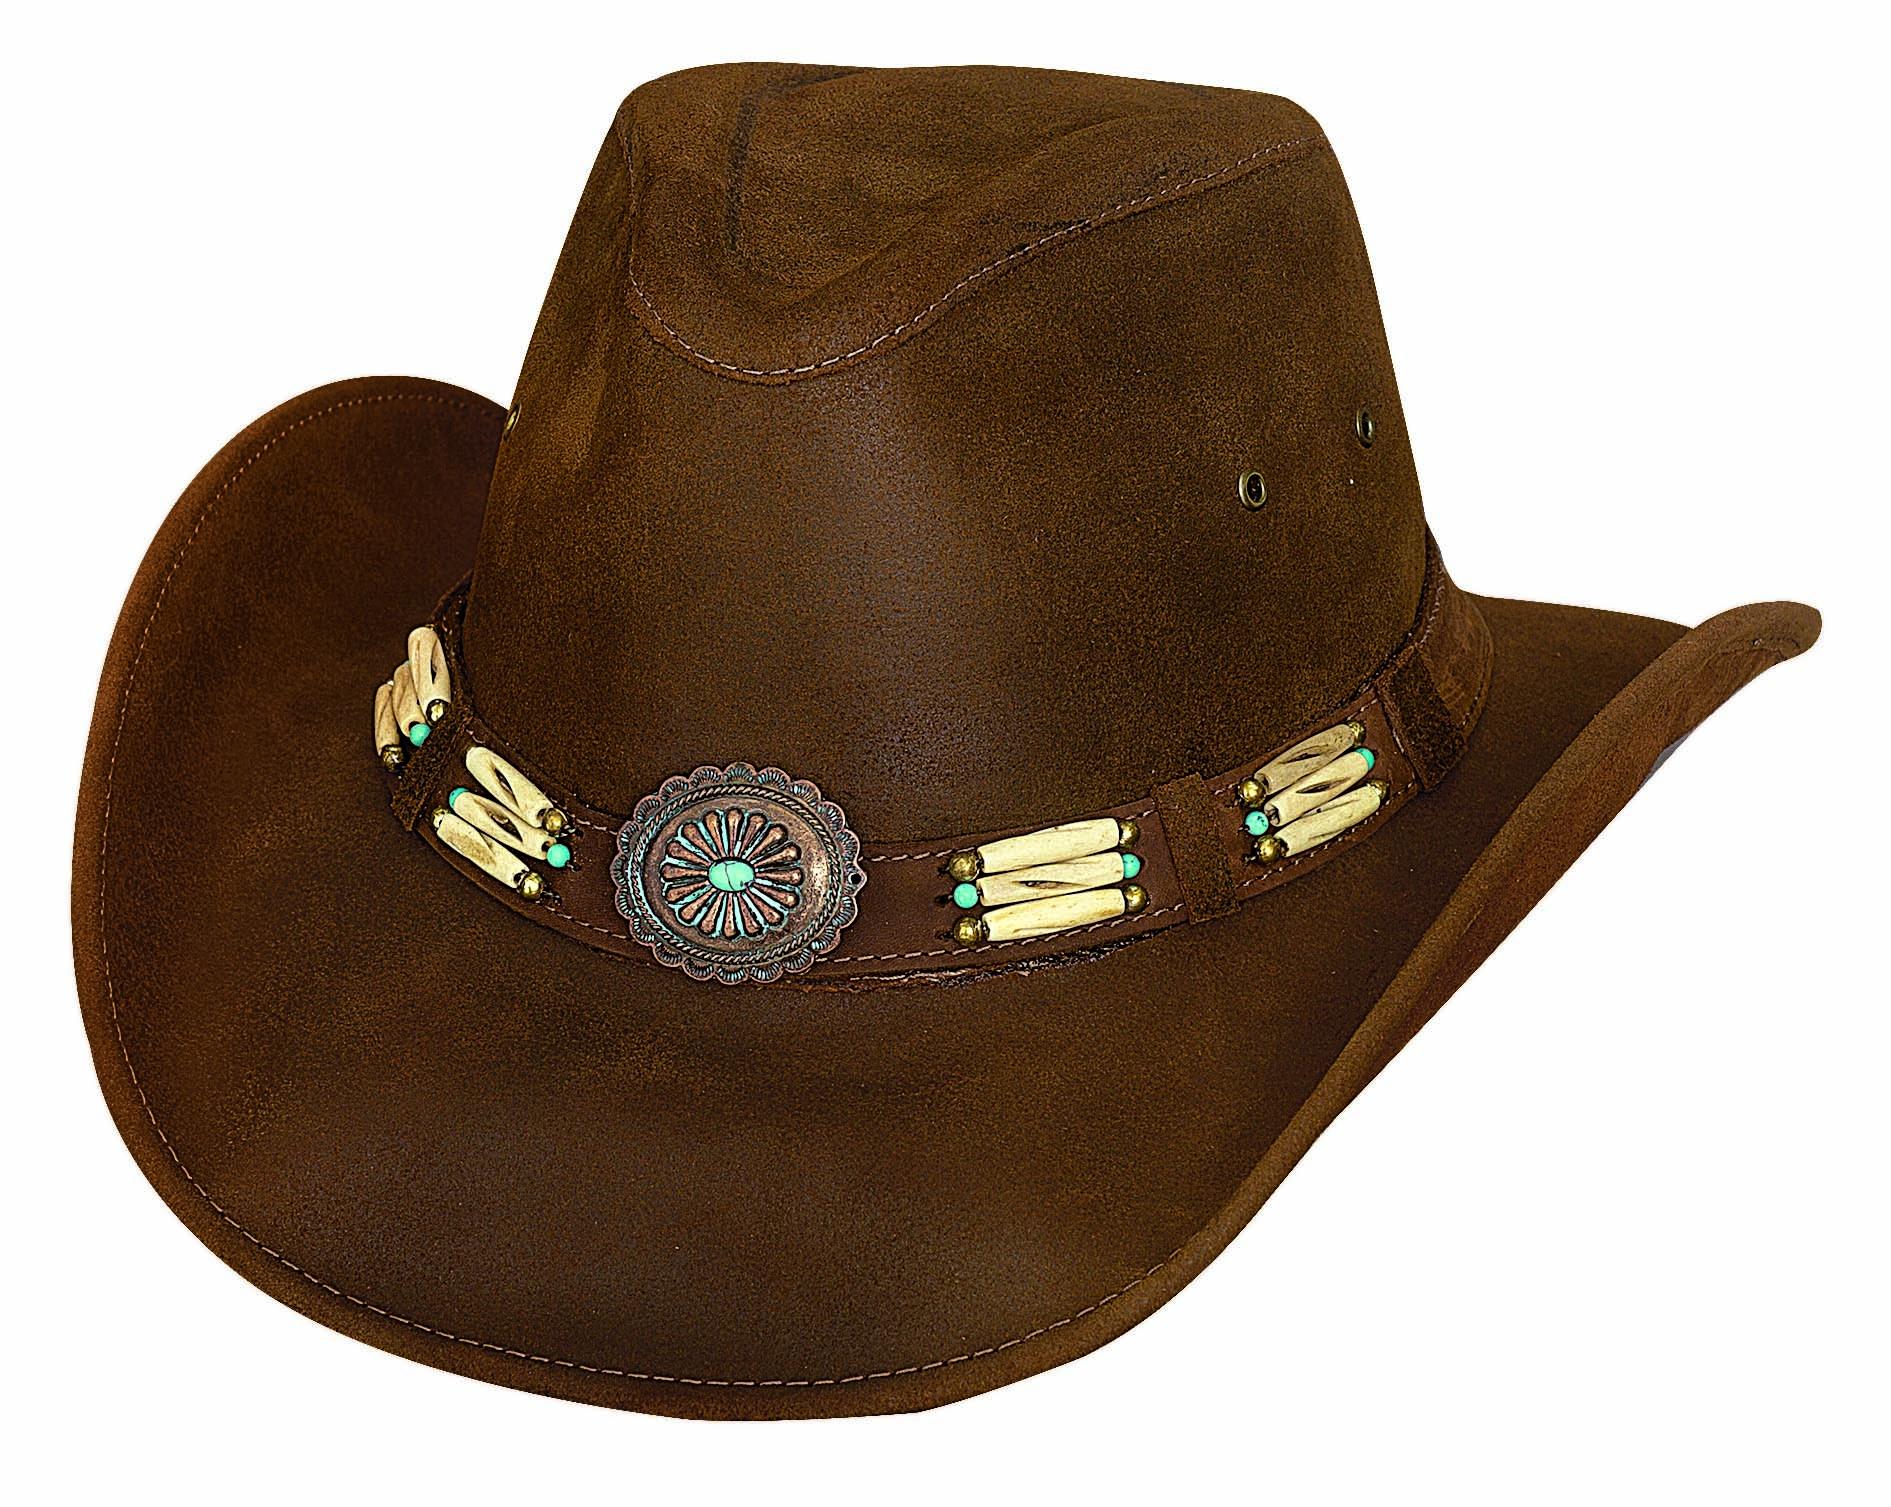 Bullhide Apalachee- Leather Cowboy Hat